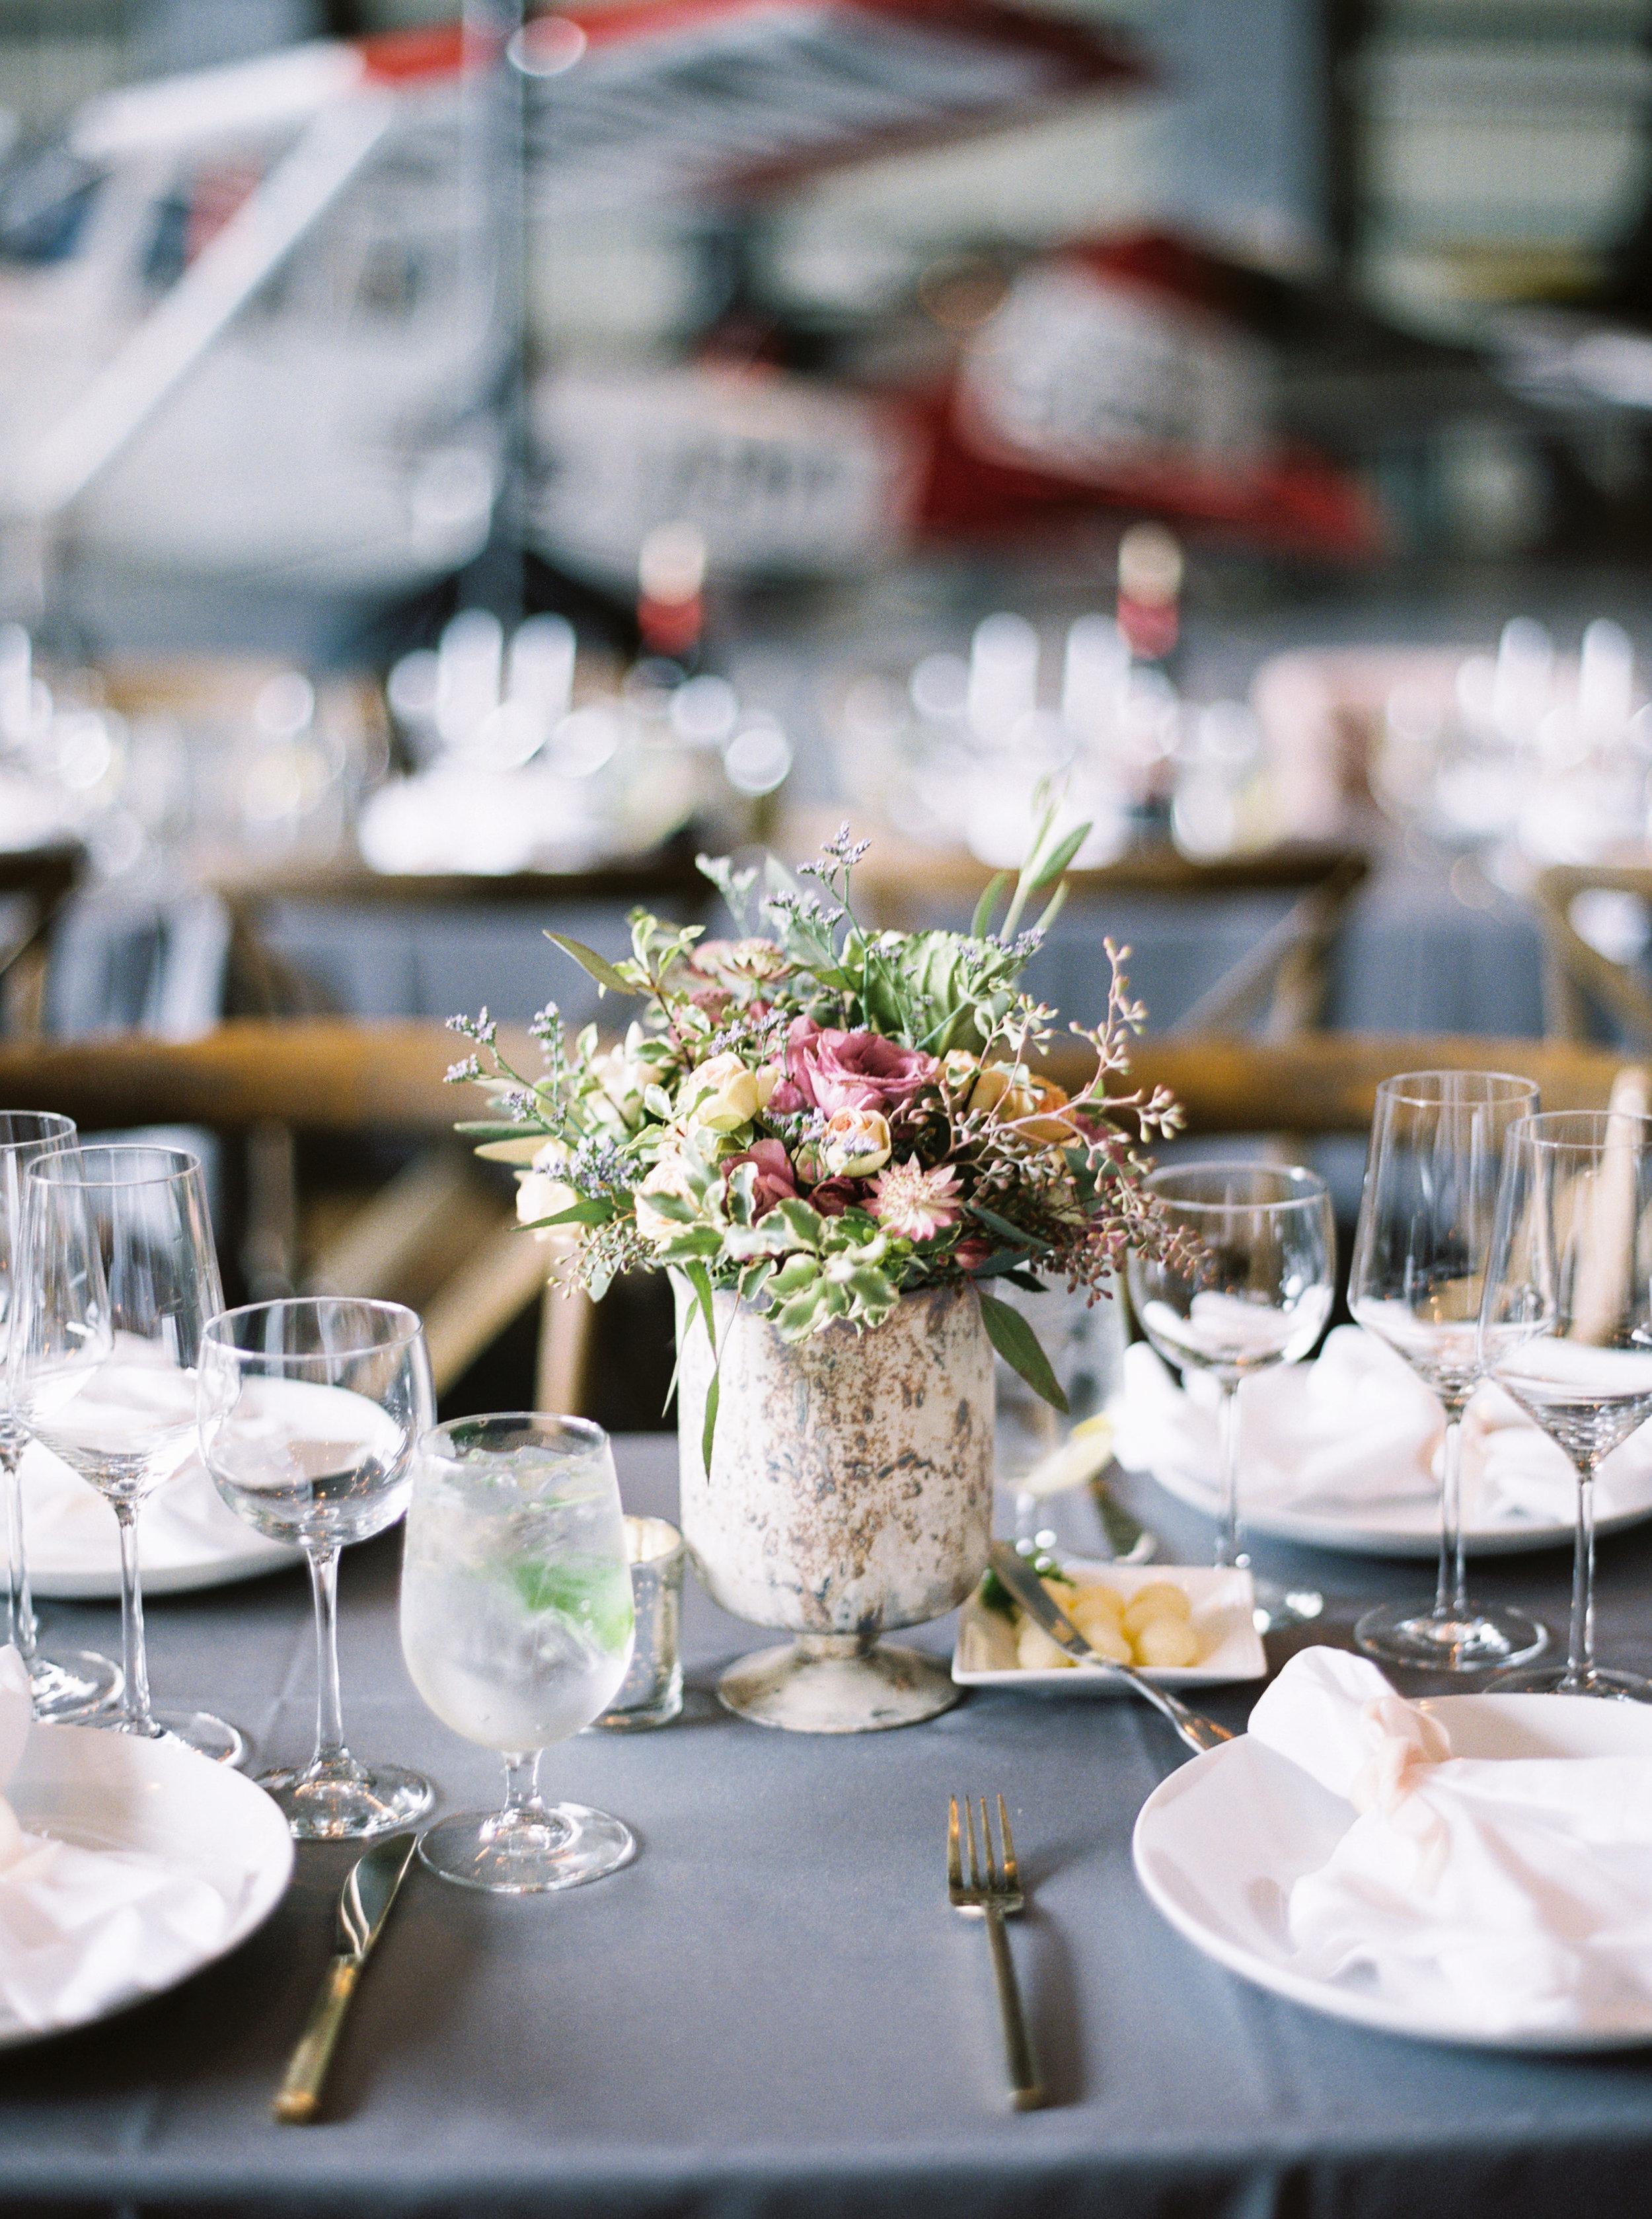 airport-hanger-wedding-at-attitude-aviation-in-livermore-28-2.jpg